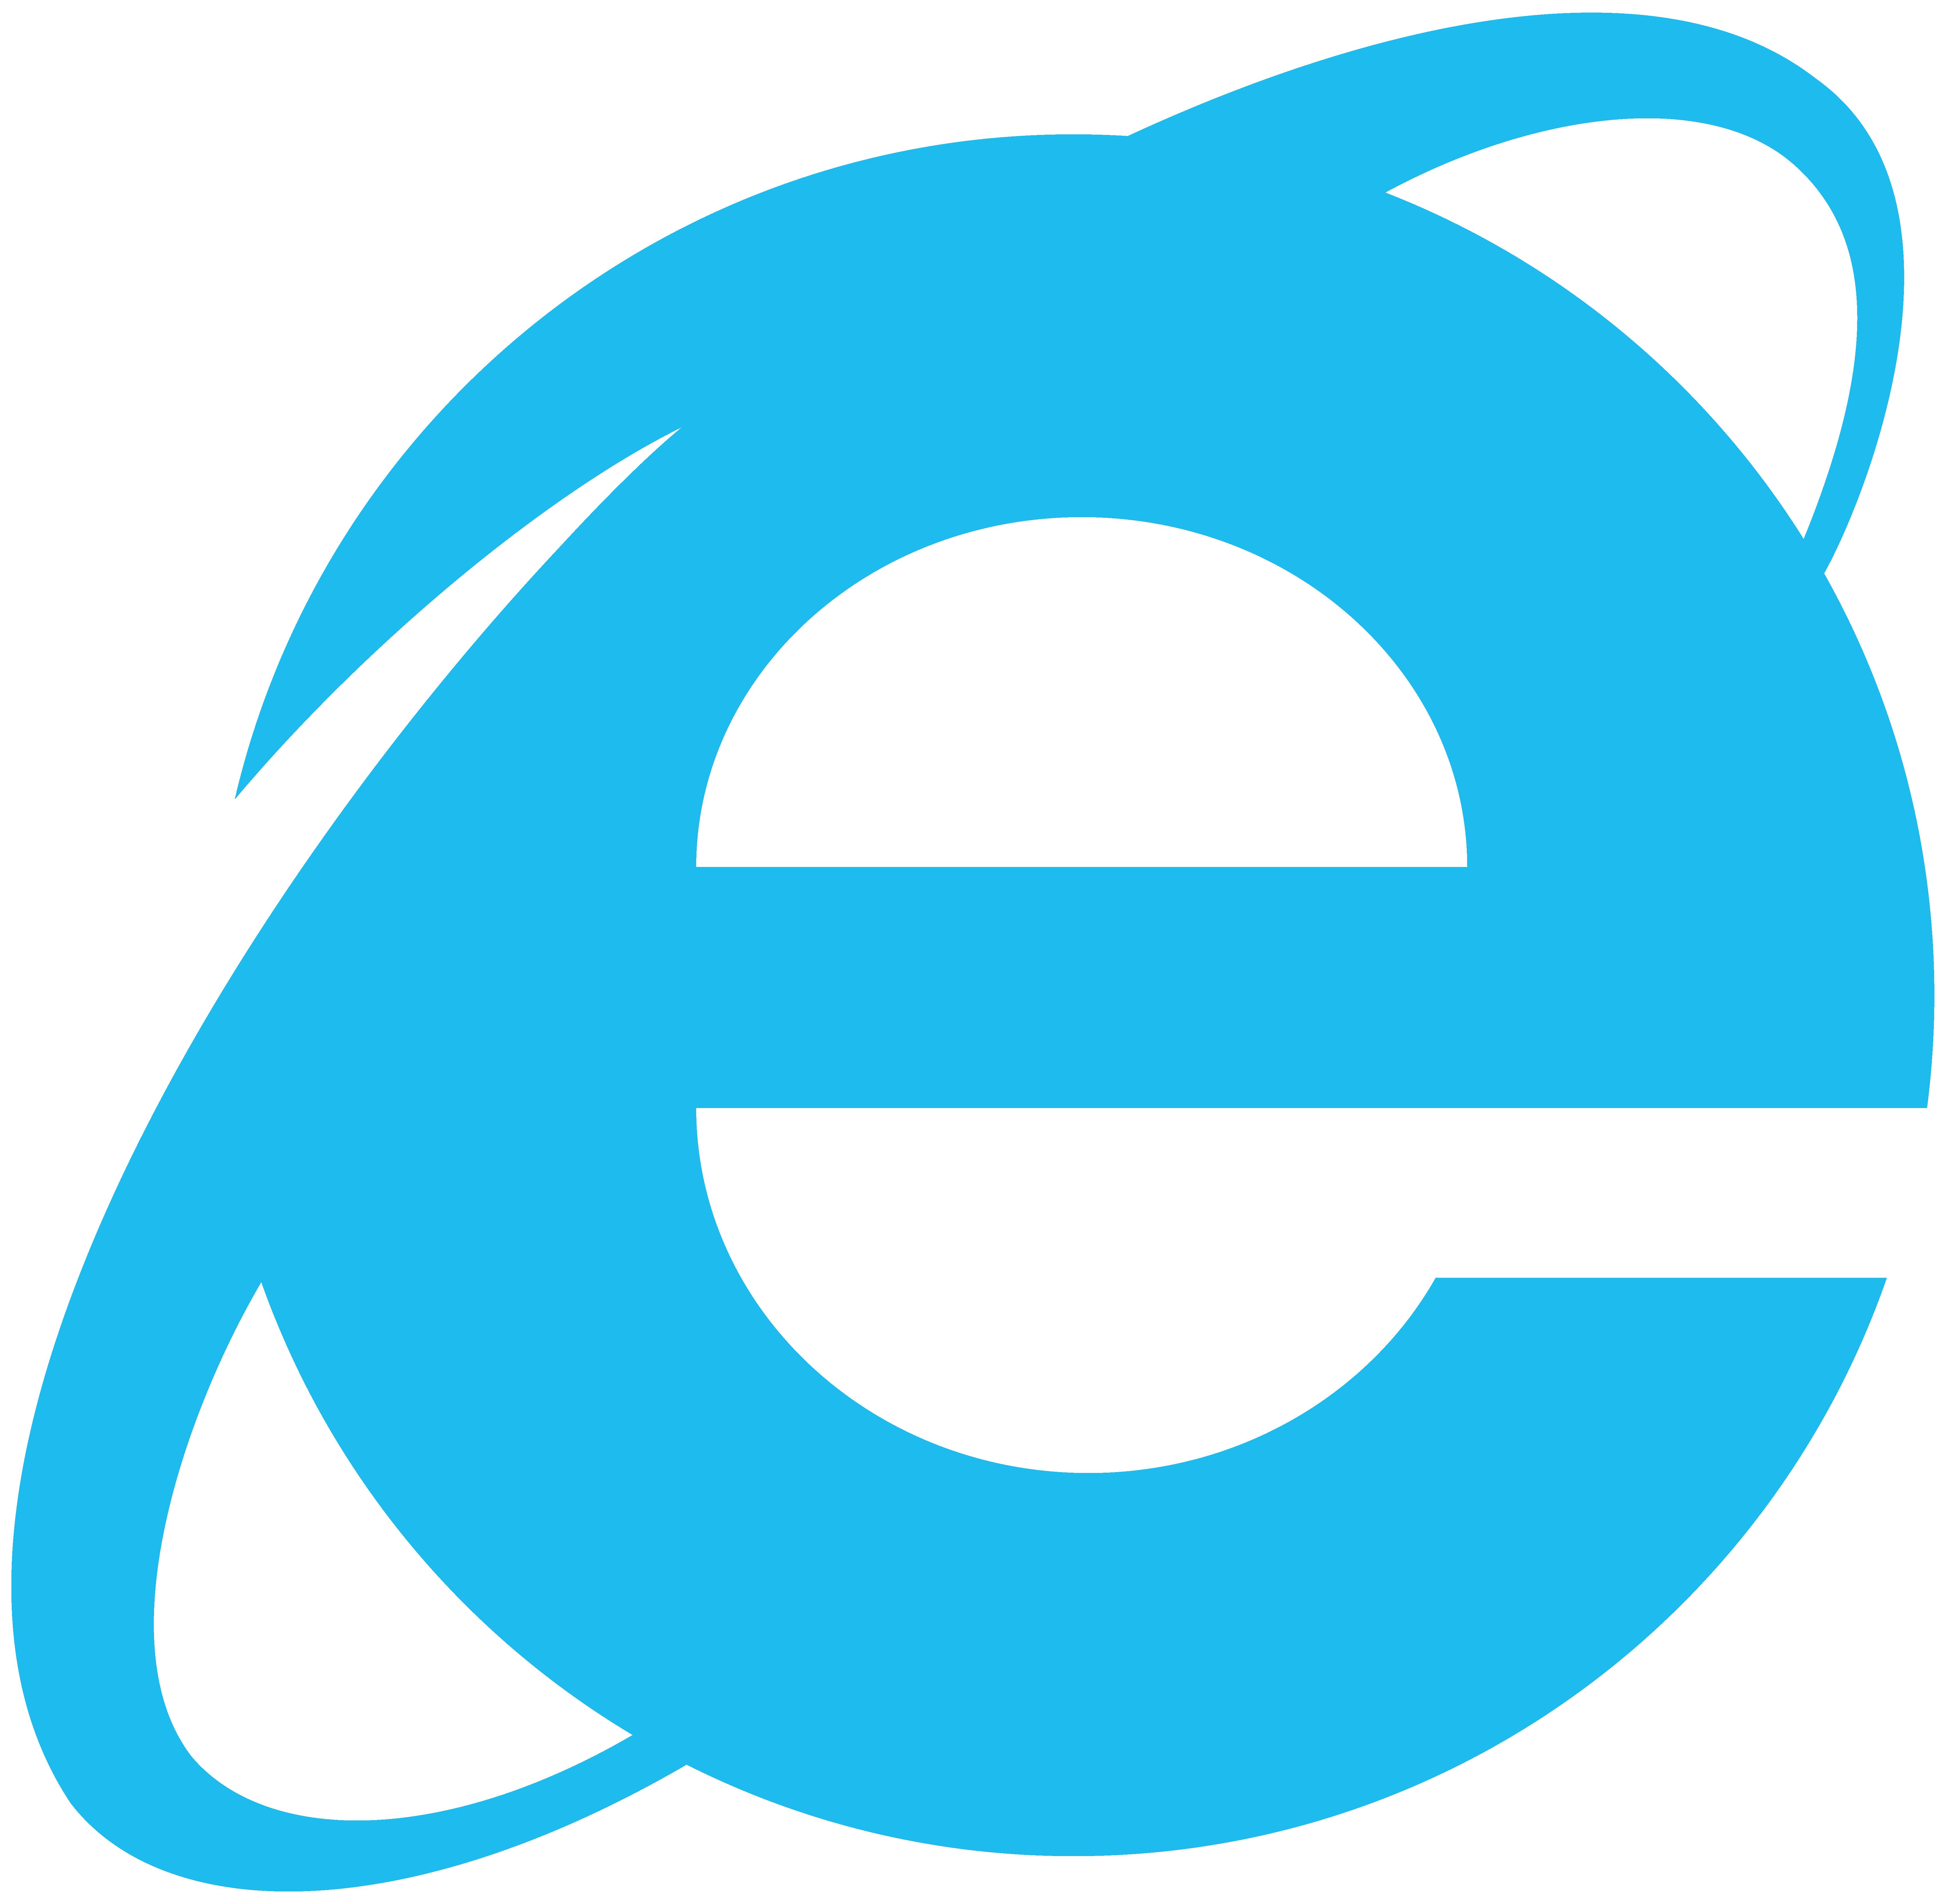 Internet Explorer Simplistic Logo, Vector